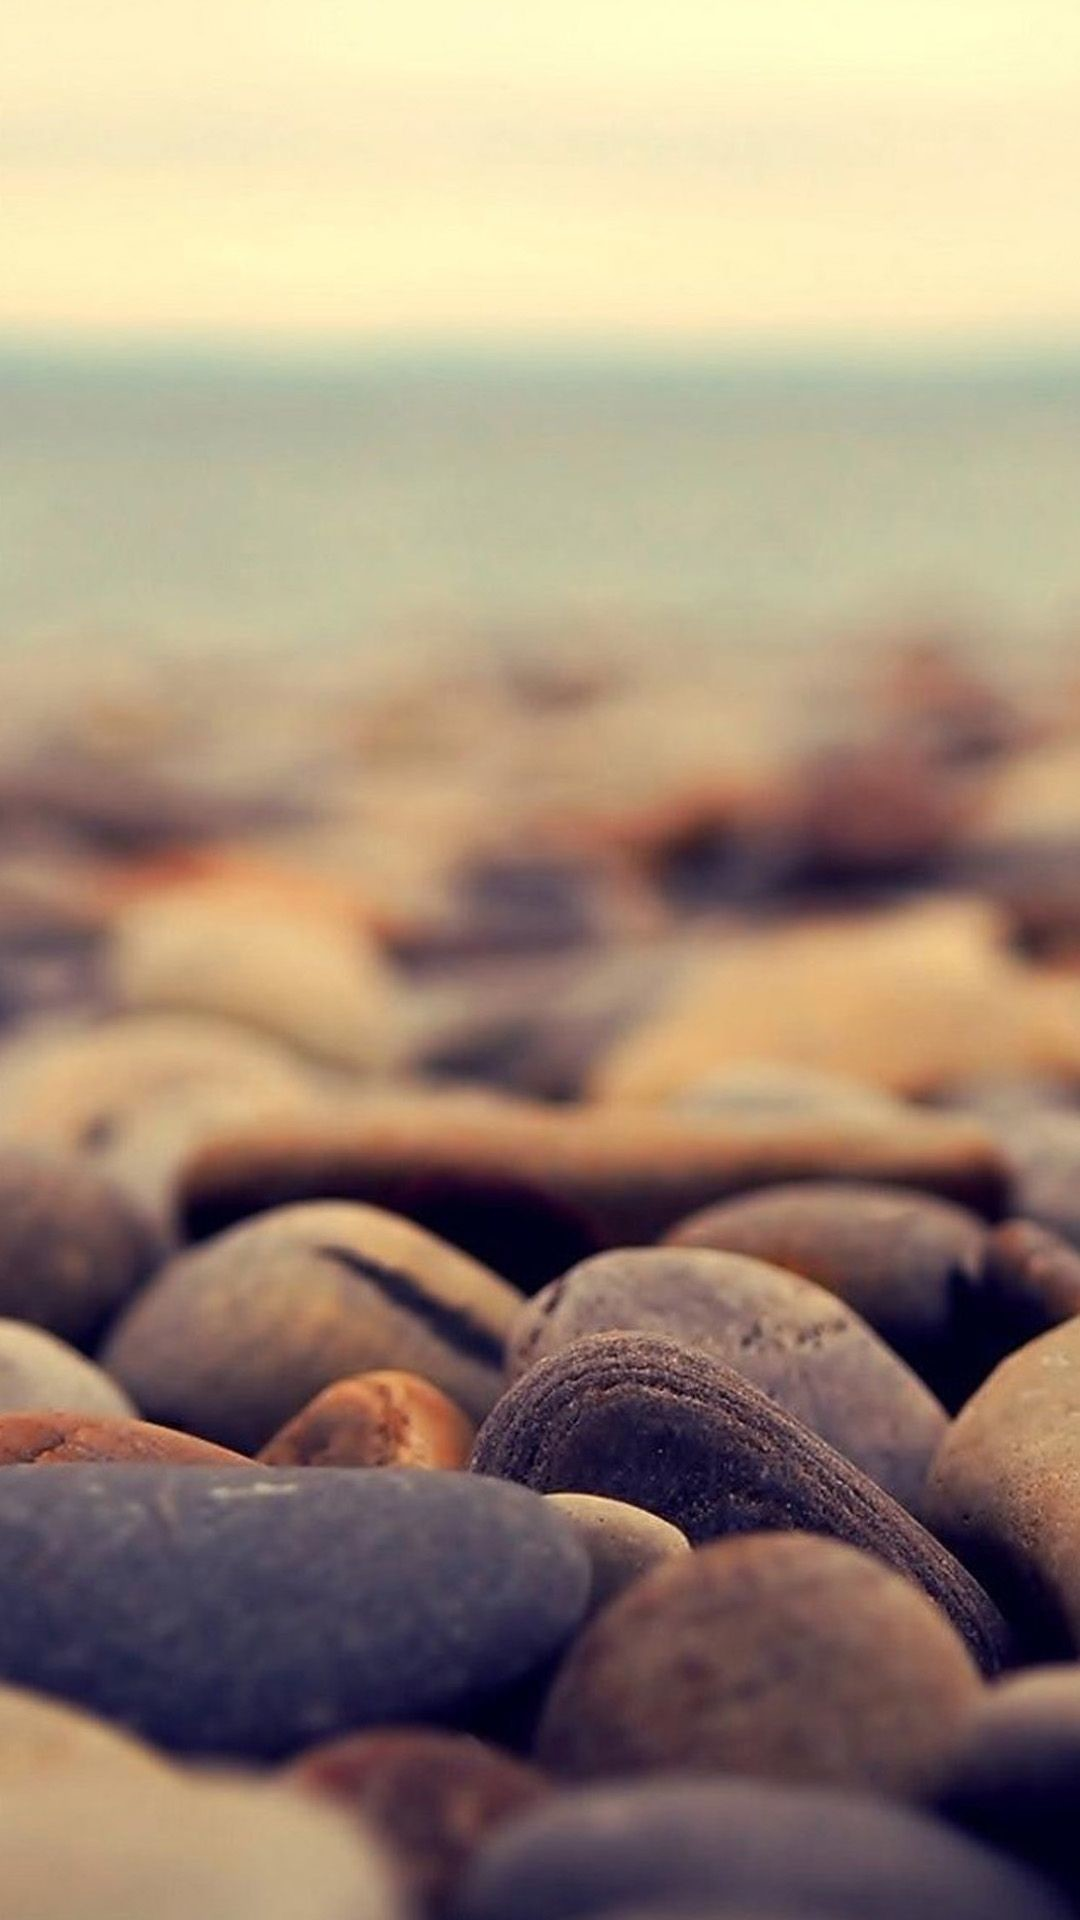 Res: 1080x1920, Pebble Beach - Optimised for iPhone 6 Plus - 1920 x 1080